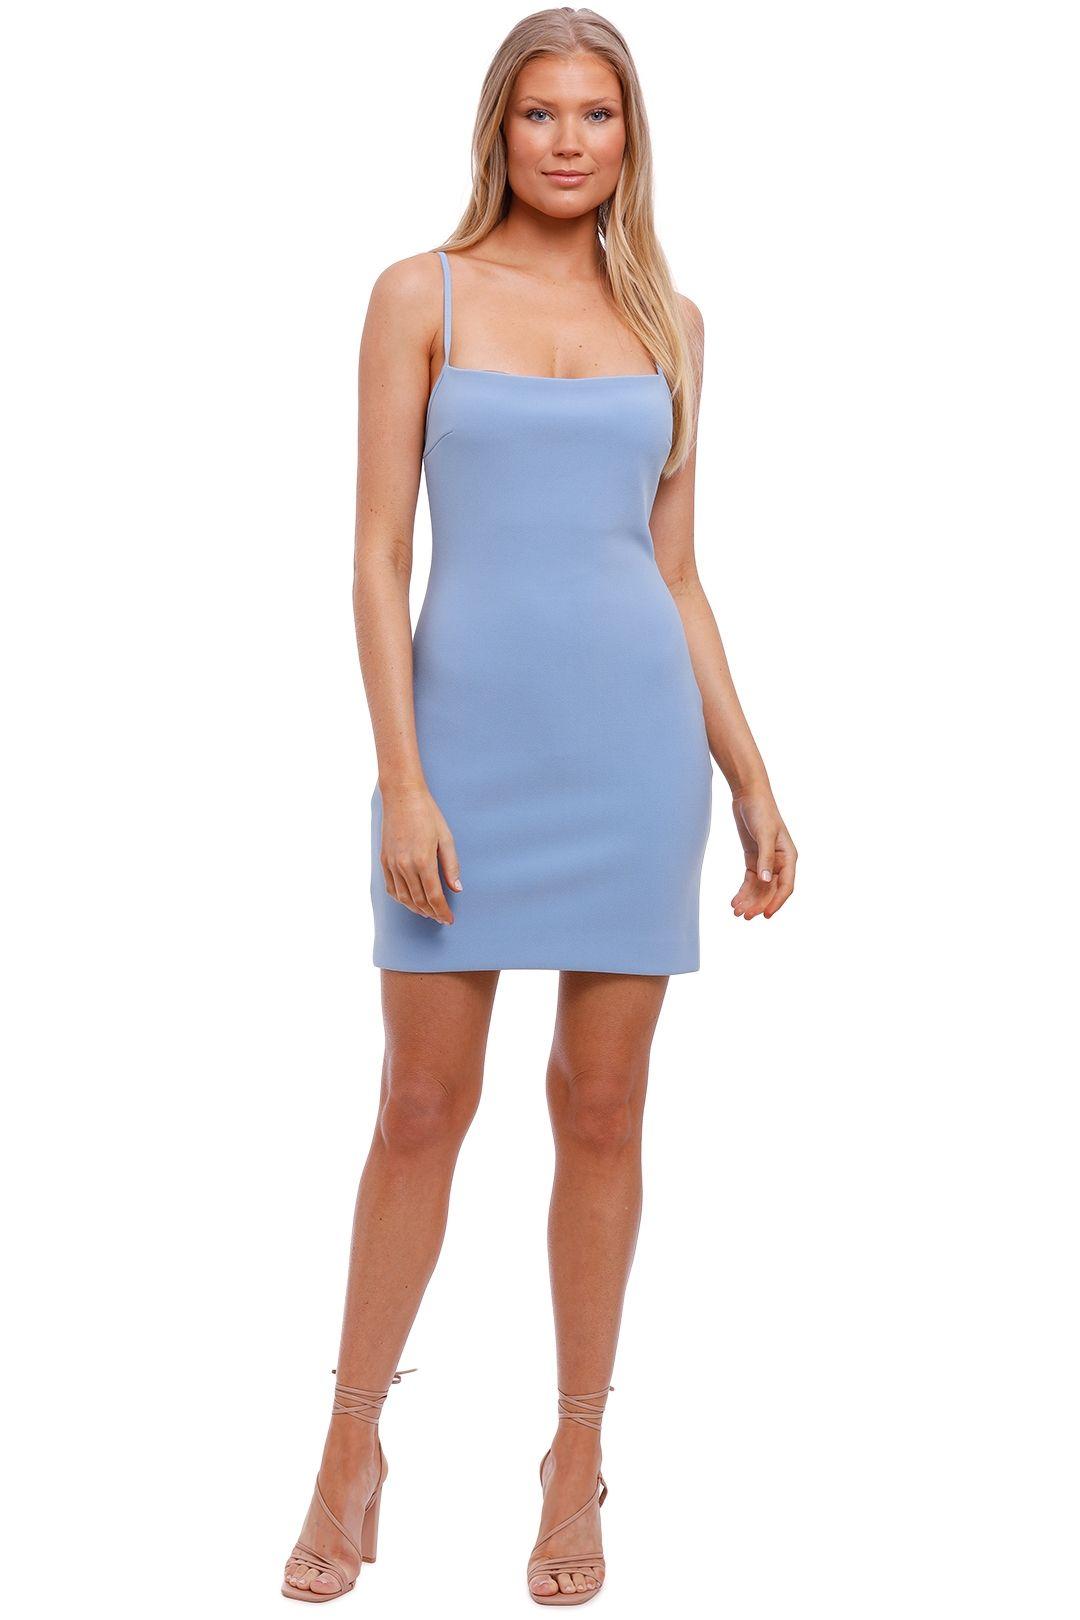 Bec and Bridge Hana Sky Blue Fitted Mini Dress